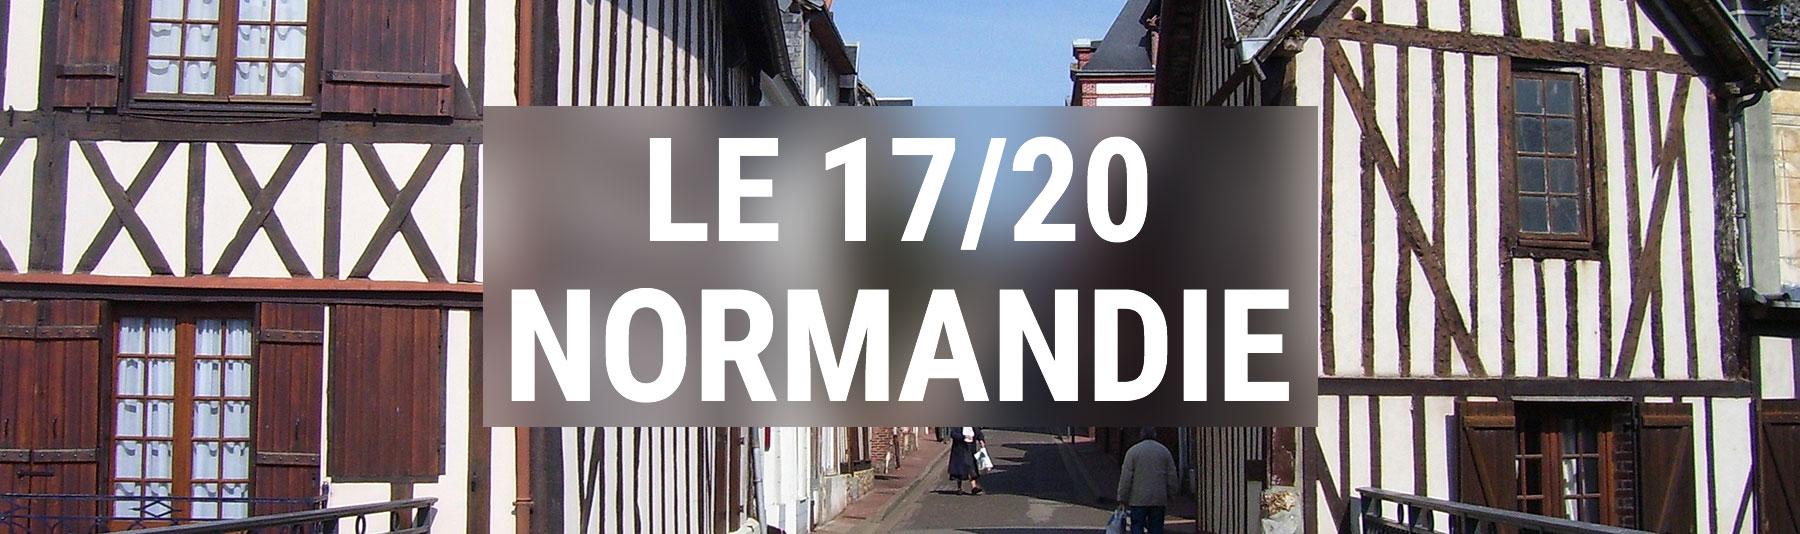 Le 17/20 Normandie